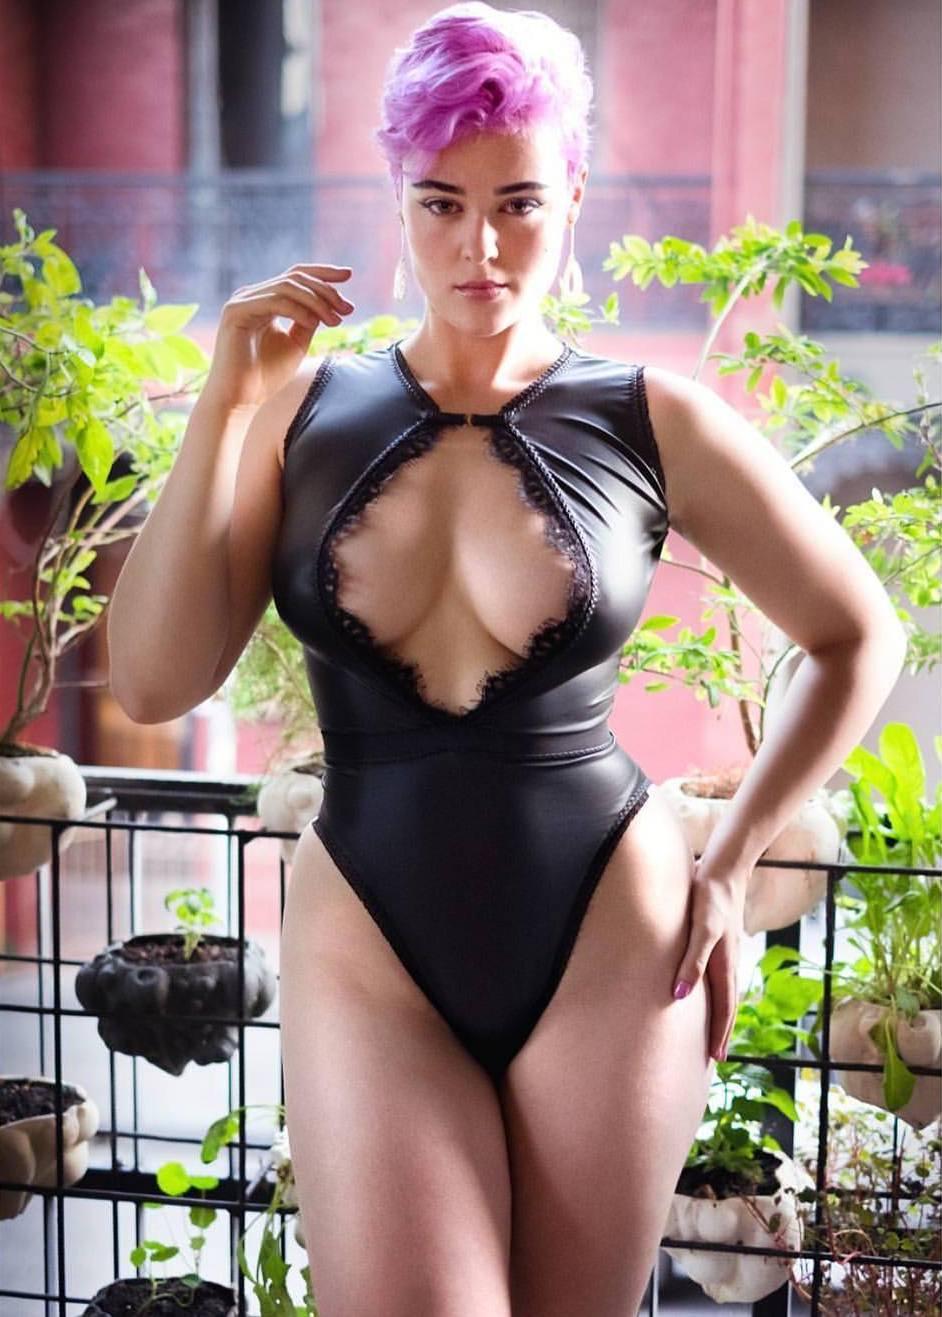 Sexy Stefania Ferrario naked (96 foto and video), Tits, Bikini, Boobs, lingerie 2017